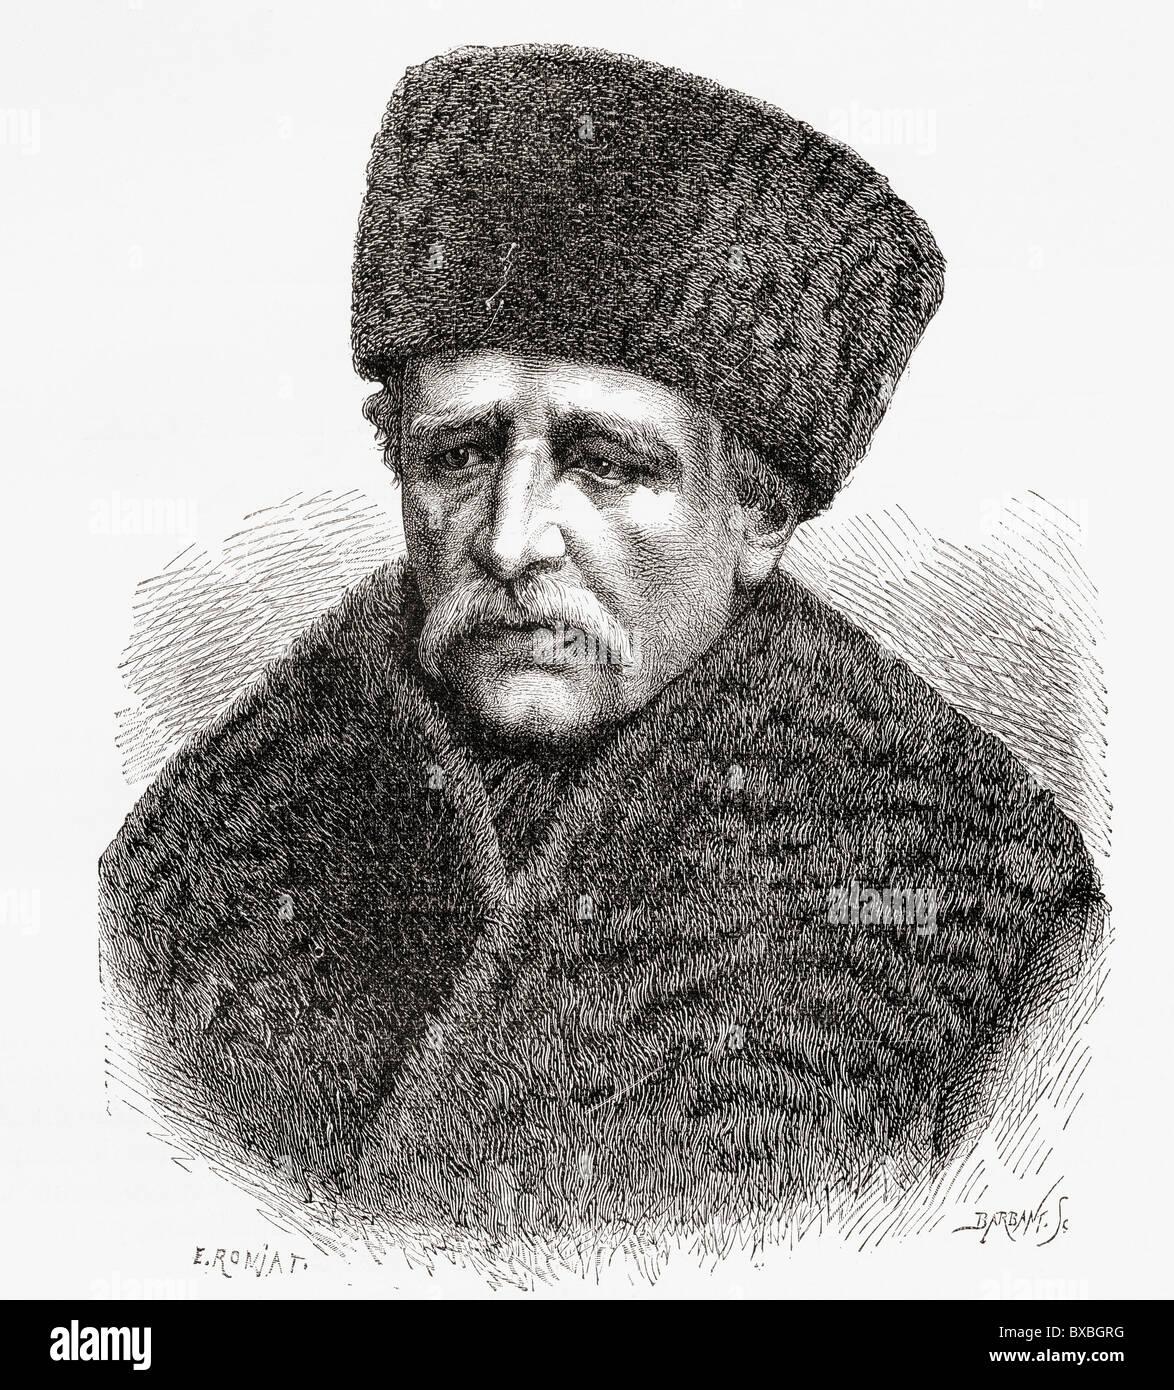 Baron Nils Adolf Erik Nordenskiöld, aka A. E. Nordenskioeld, 1832 to 1901. Baron, geologist, mineralogist and arctic Stock Photo